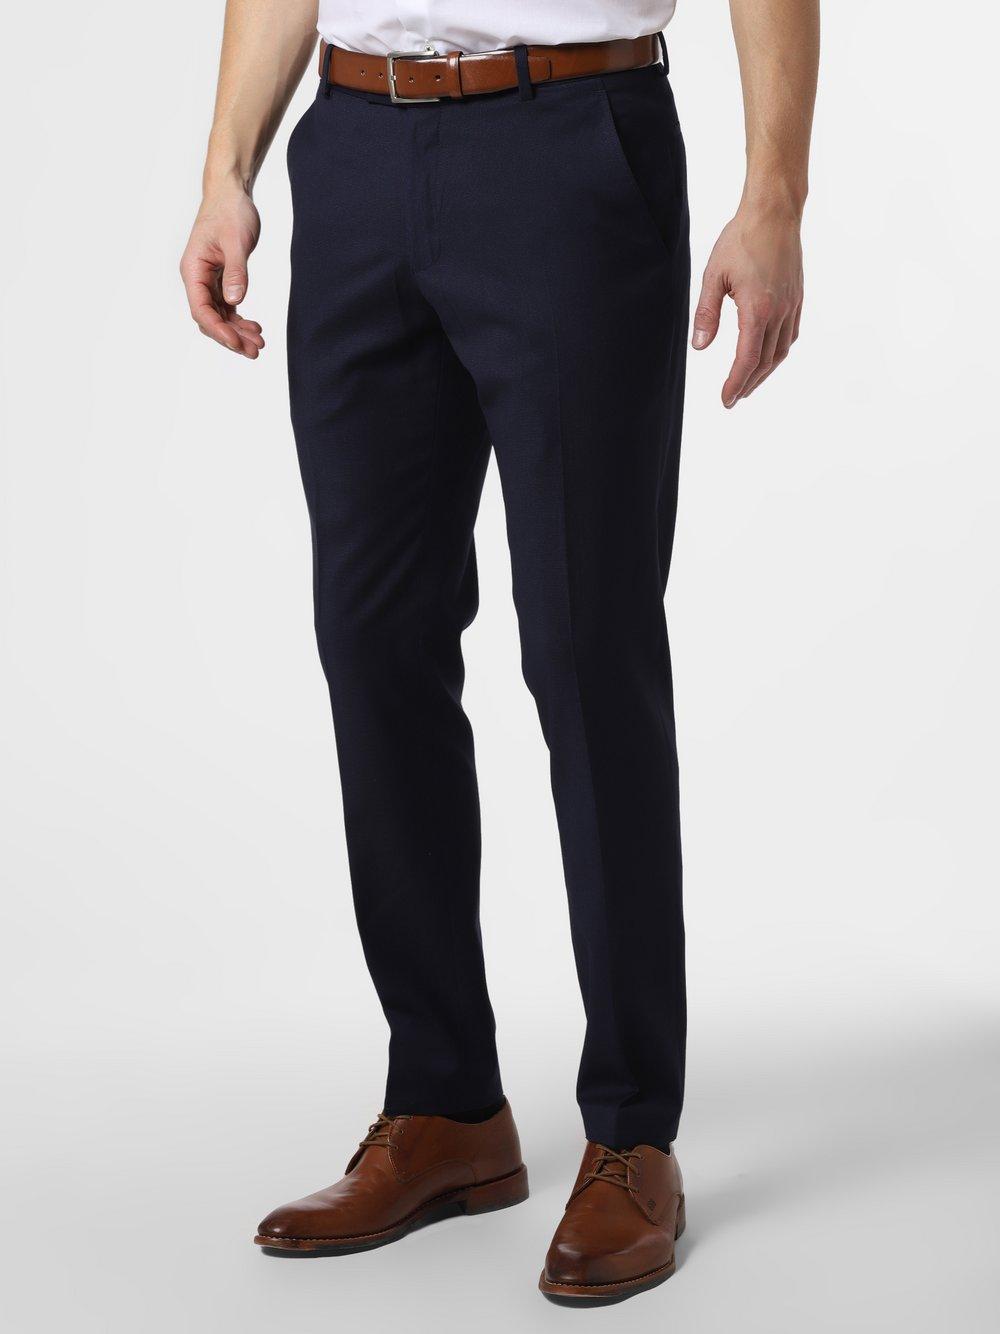 Mc Earl – Męskie spodnie od garnituru modułowego – Manhatten, niebieski Van Graaf 462649-0004